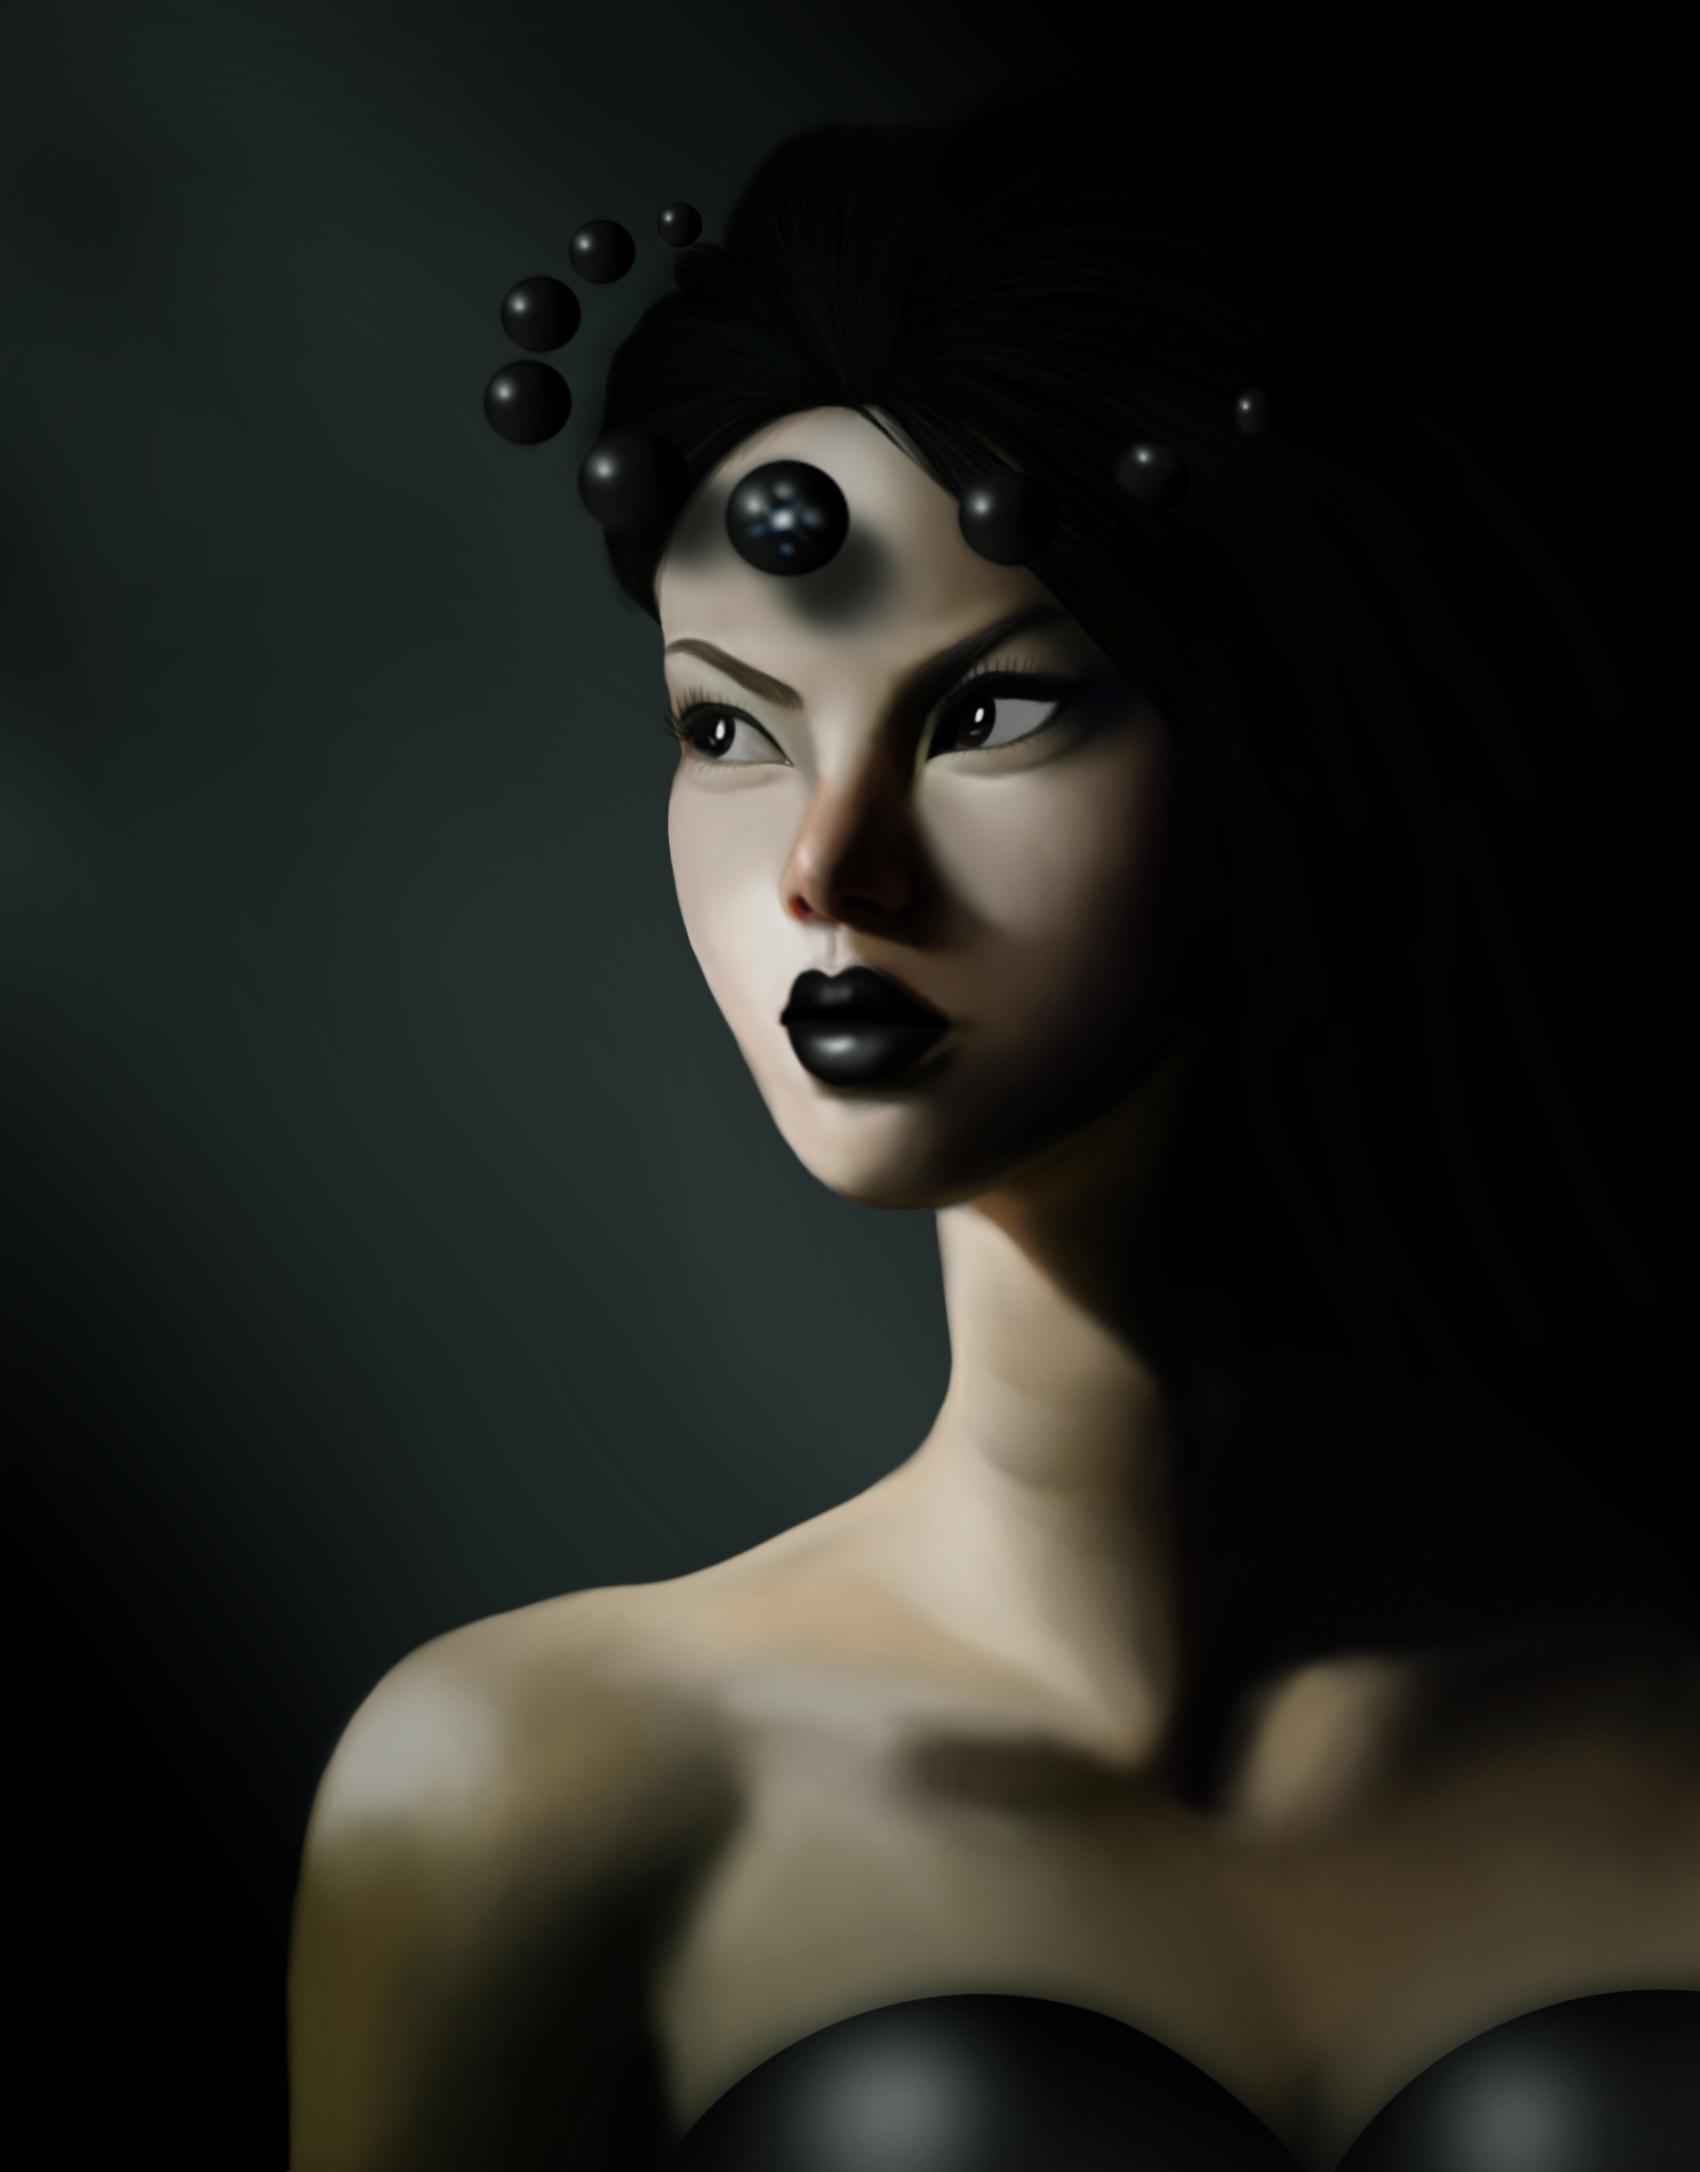 Dark Princess by thataemer